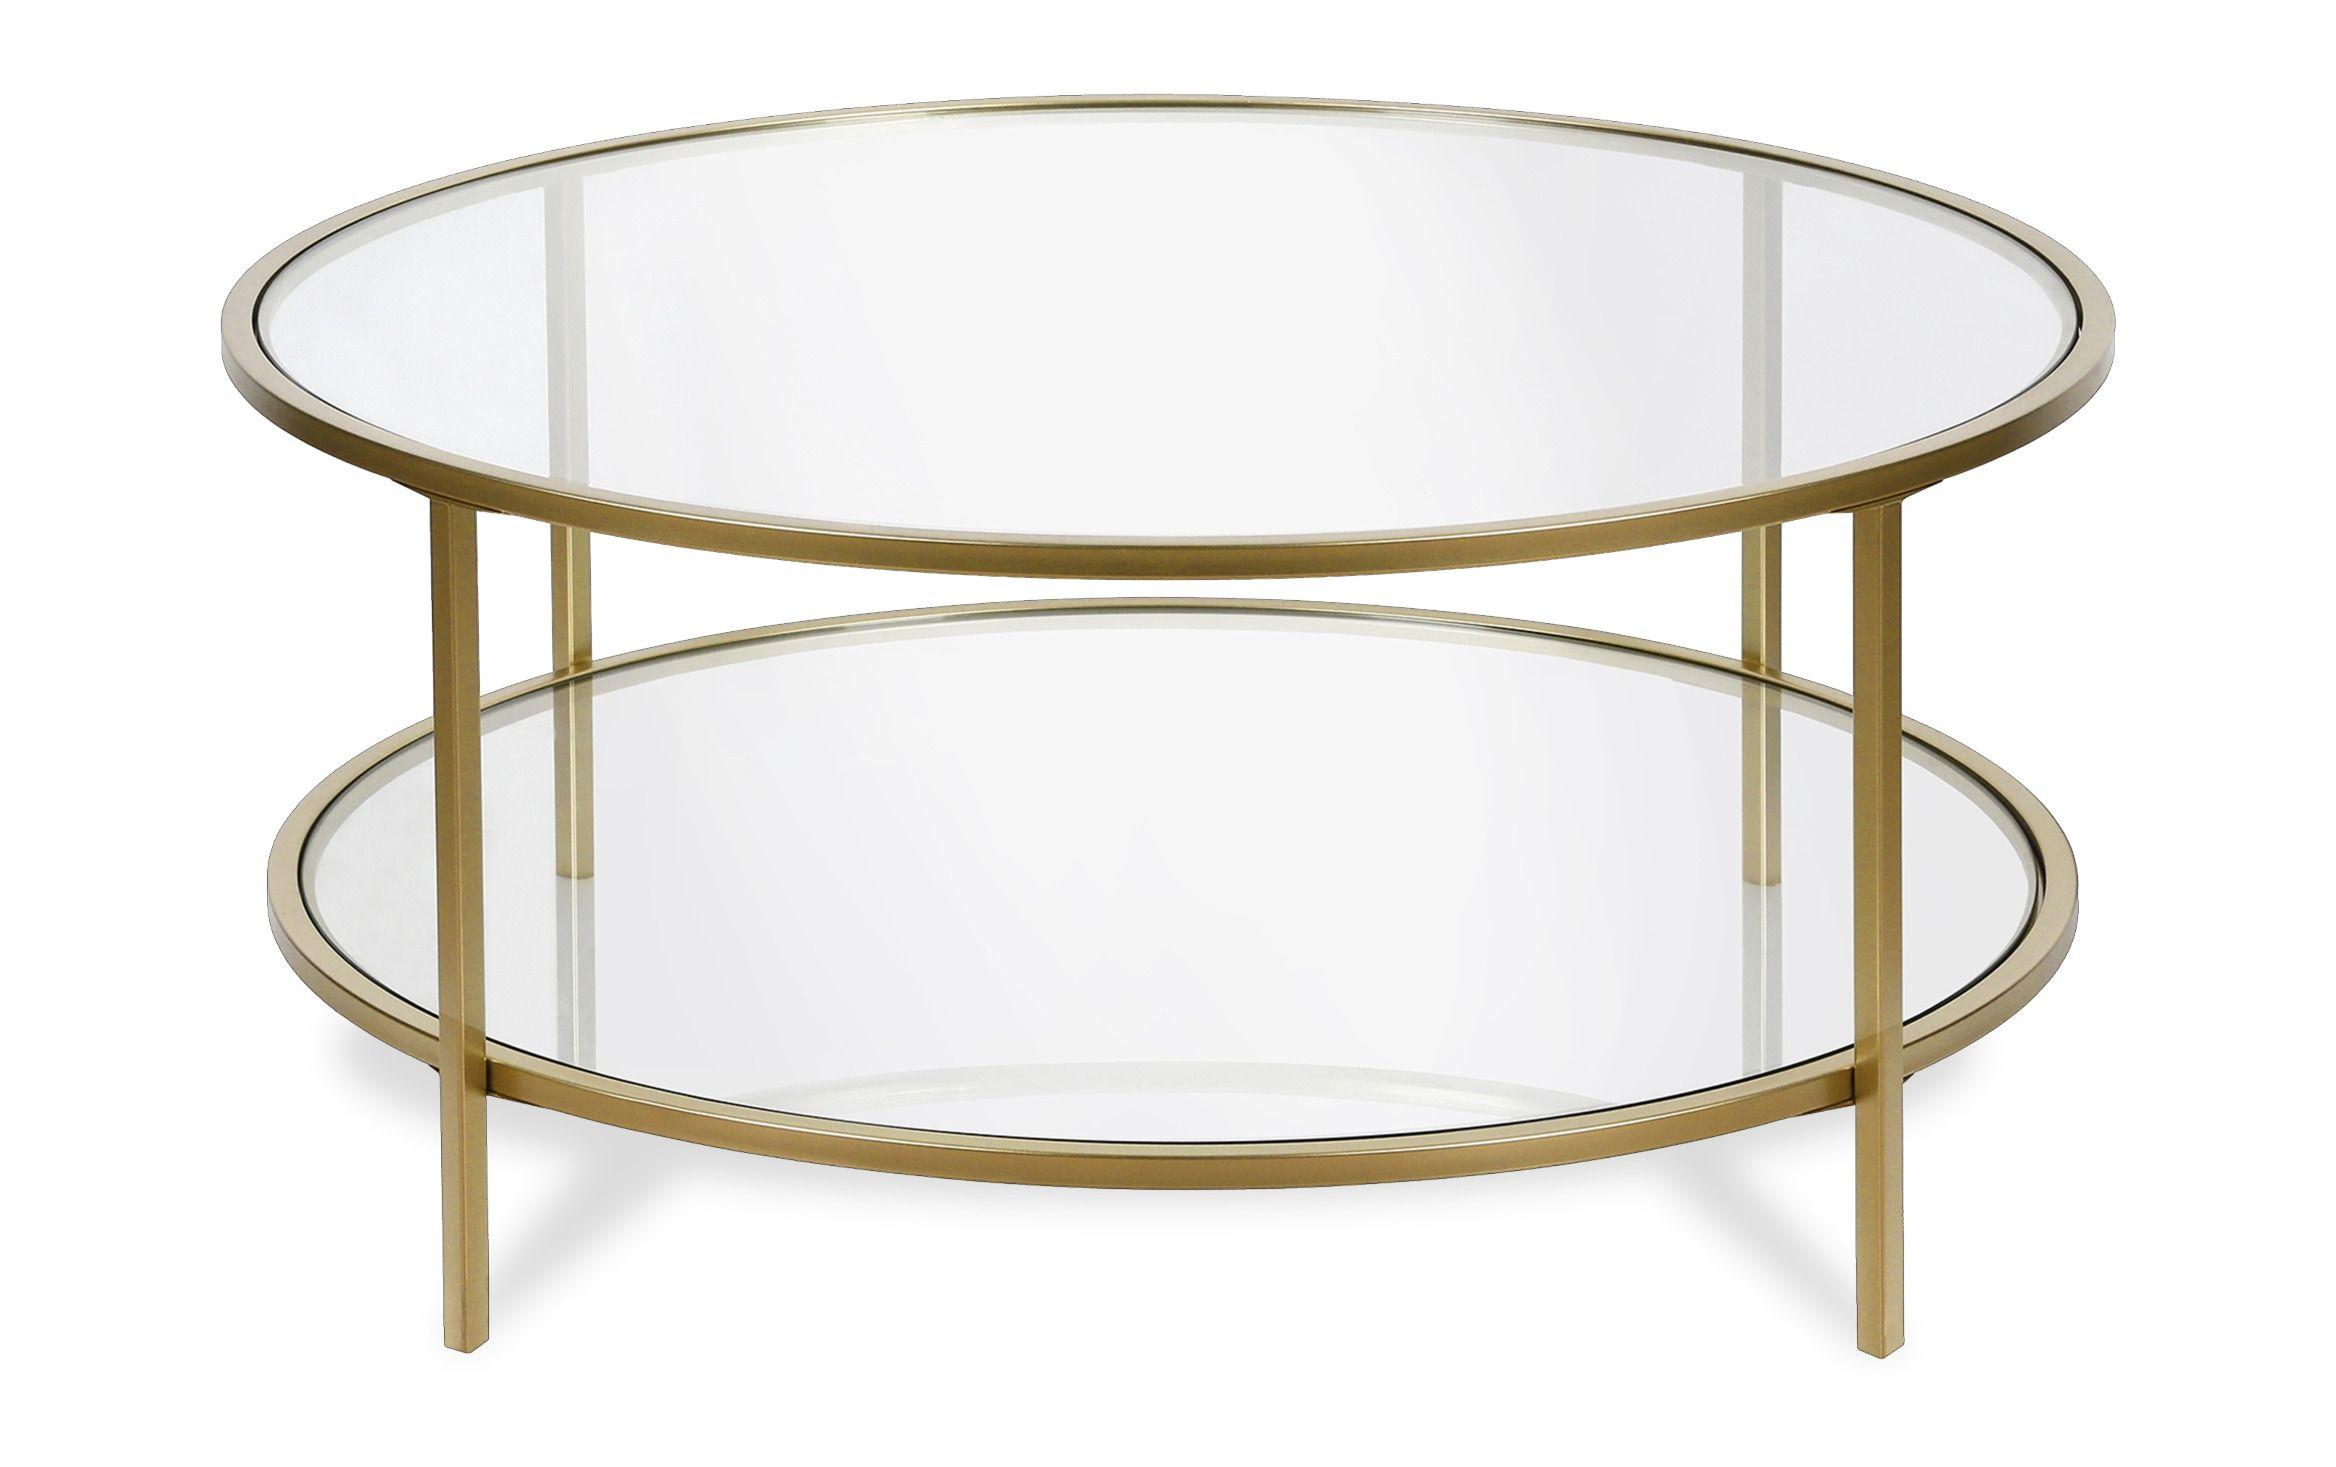 Linda Nickel Coffee Table Coffee Table Gold Coffee Table Gold Glass Coffee Table [ 1467 x 2336 Pixel ]